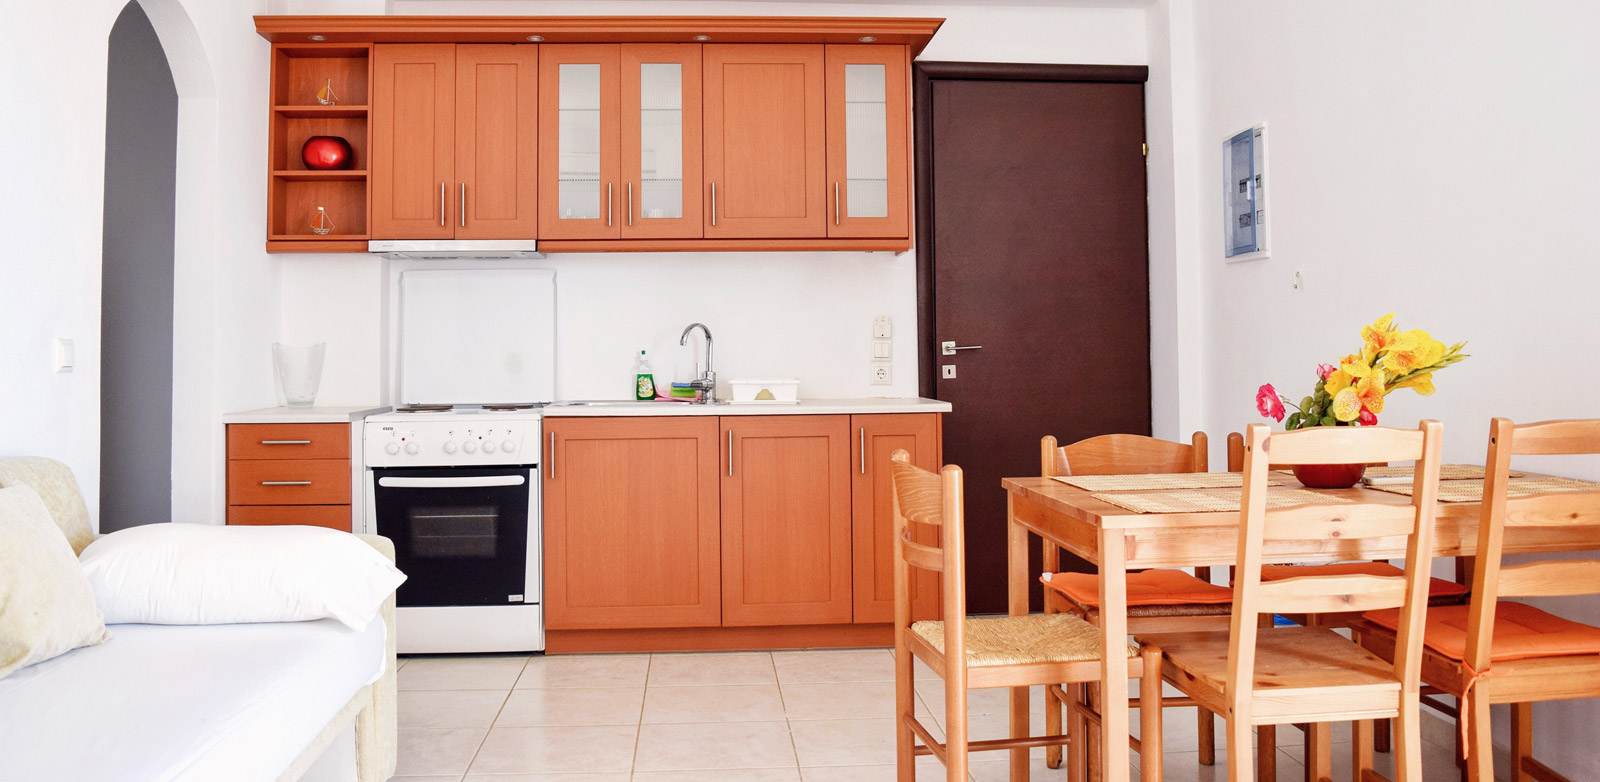 kefalonia_apartments_skala_kefalonia_accommodation_02